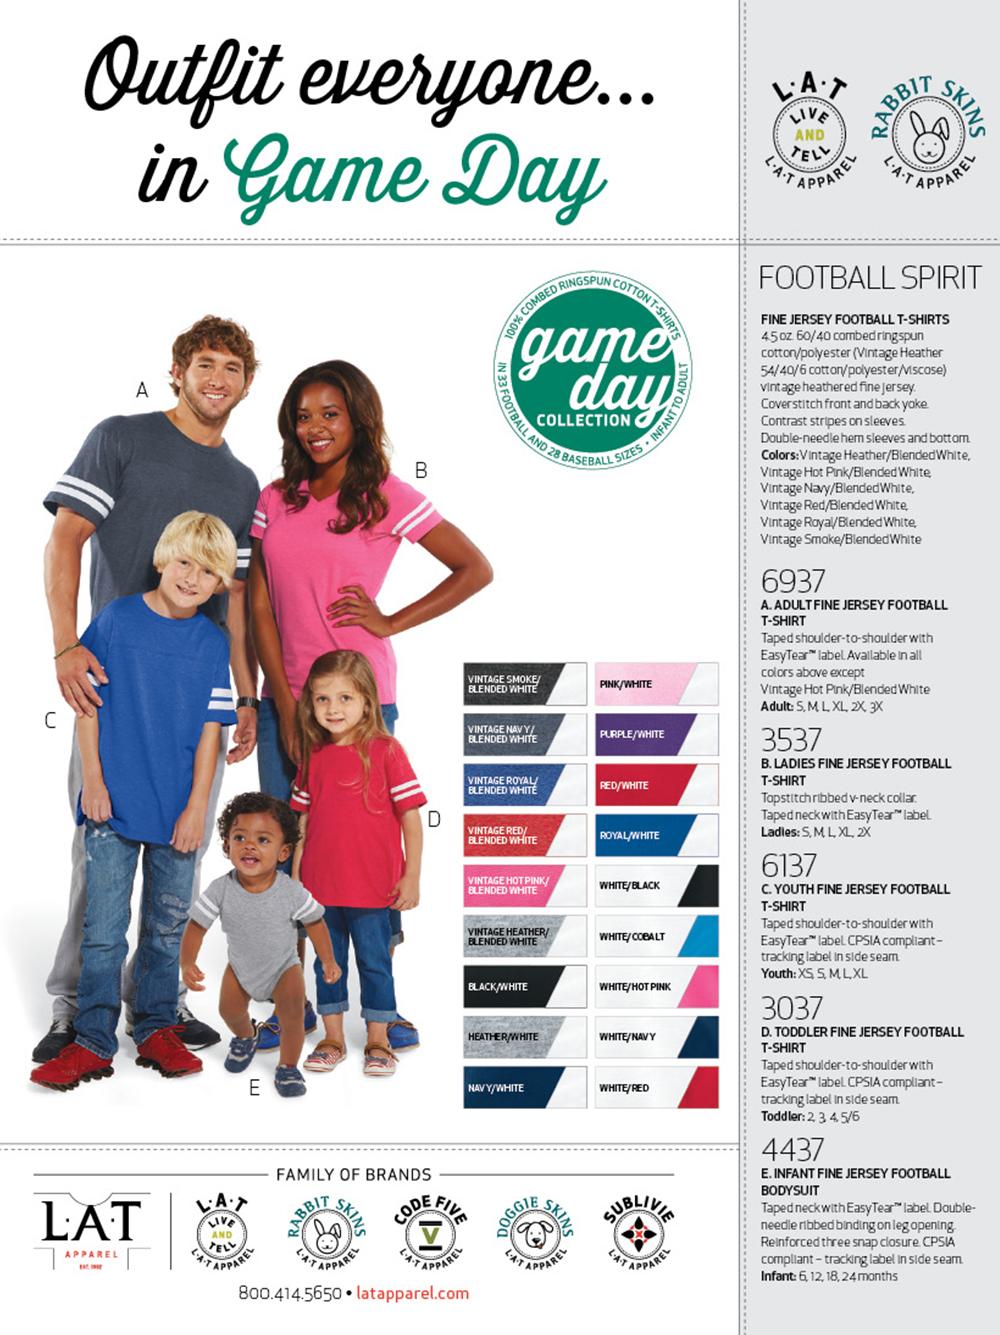 LAT_Letter_0001_LAT_Game Day_2015_Flyer.jpg